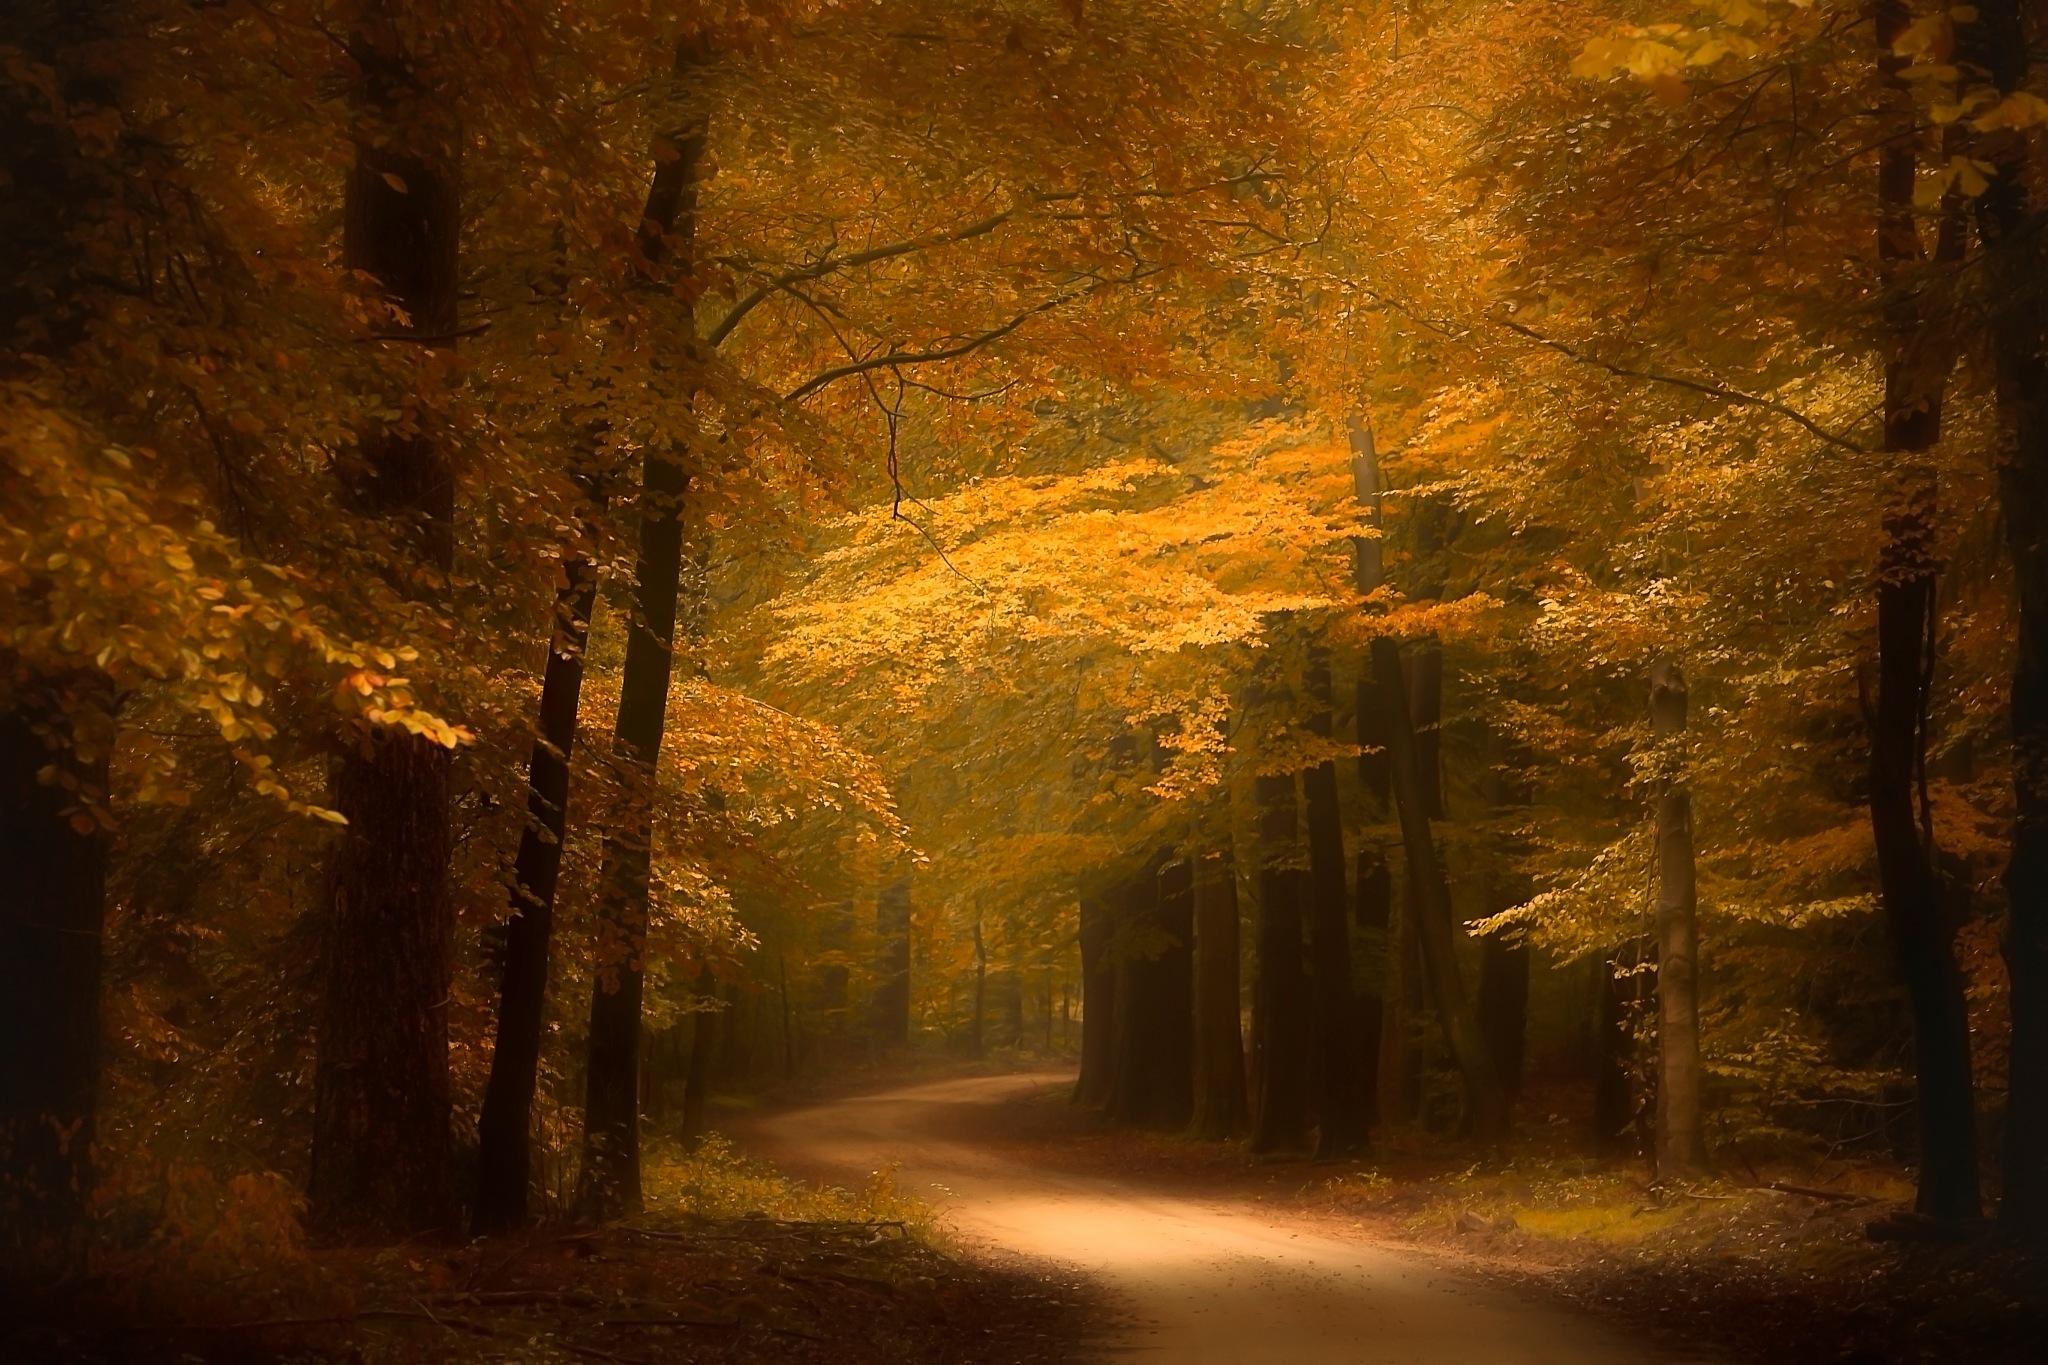 Golden forest by Erwin Stevens